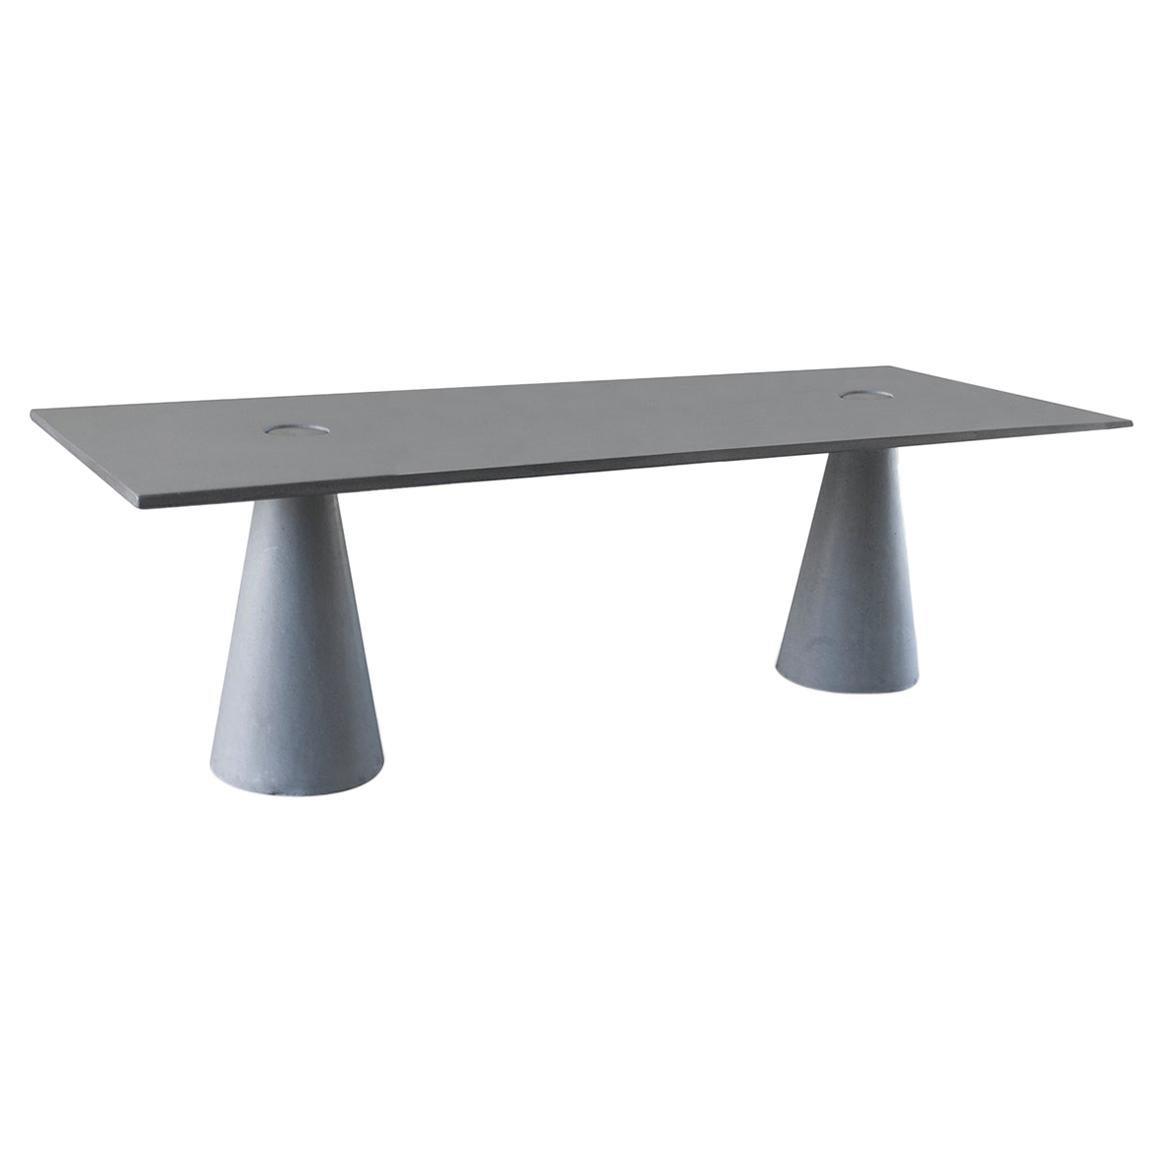 "James de Wulf Concrete Rectangular Double Locking Table, 120"""